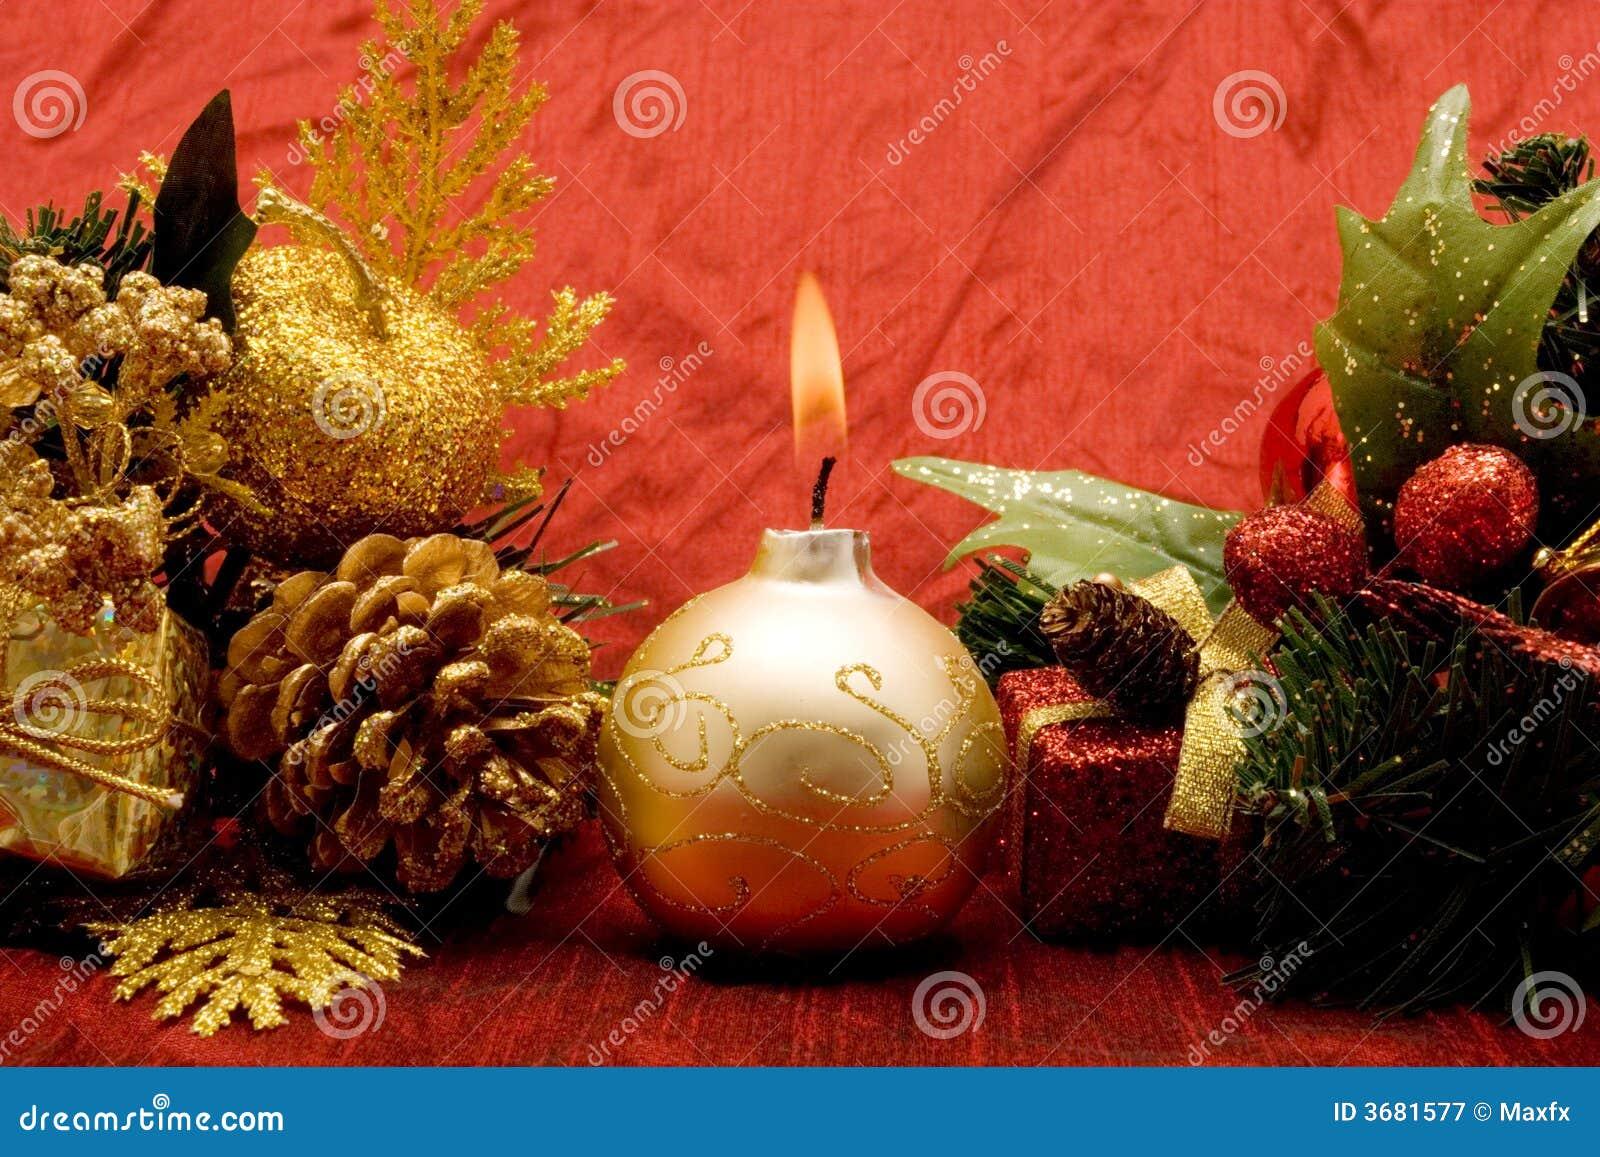 Beautiful Christmas Ornaments Royalty Free Stock ...